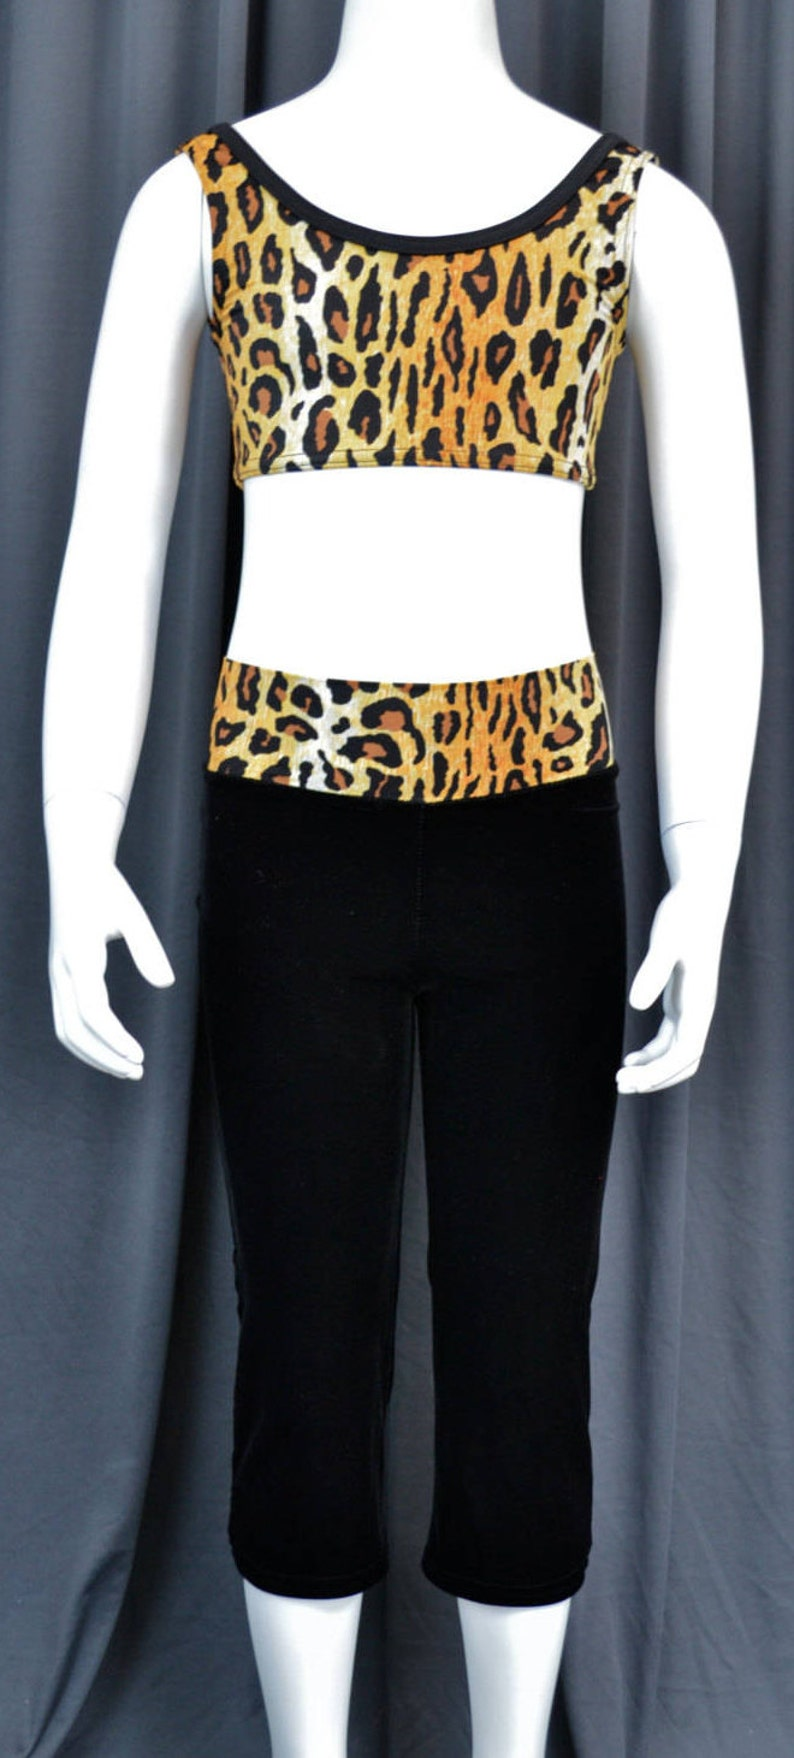 4d5a6457b Dancewear Girl 2 Piece Animal Print Scoop Neck Crop Top Black